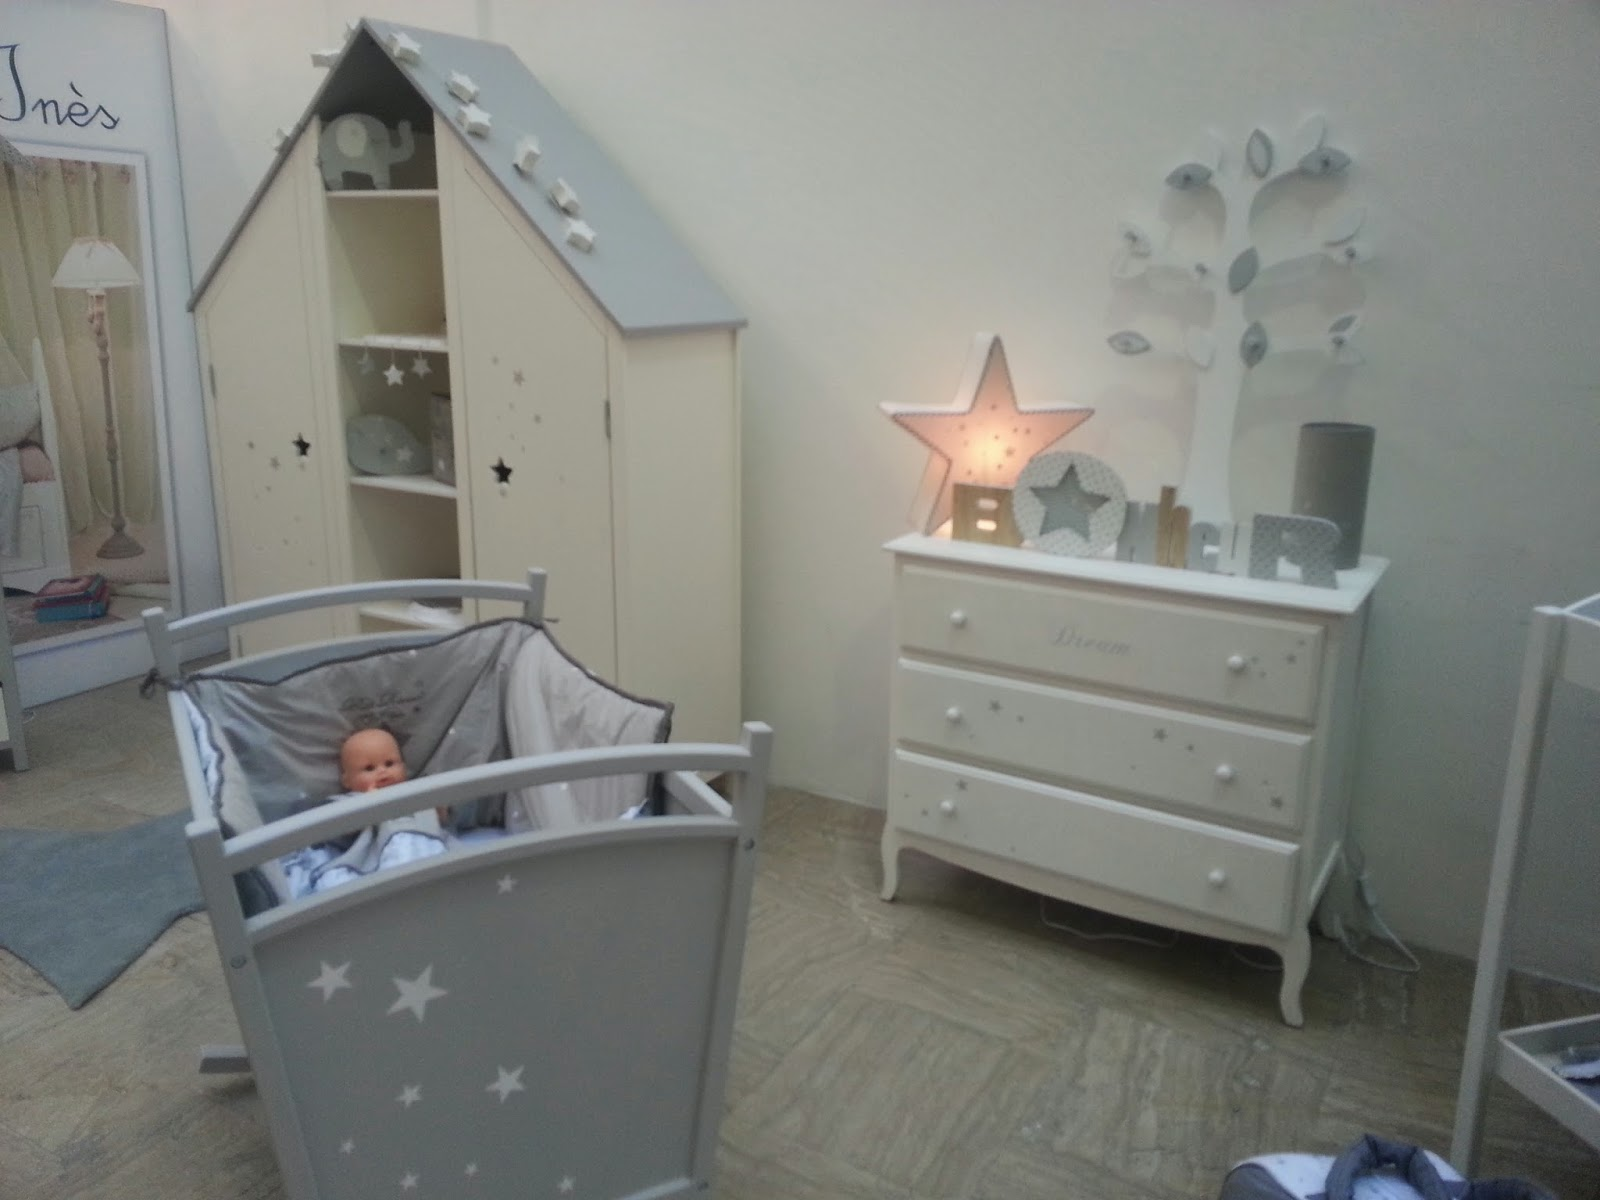 maison du monde bebe enfants la nouvelle collection. Black Bedroom Furniture Sets. Home Design Ideas